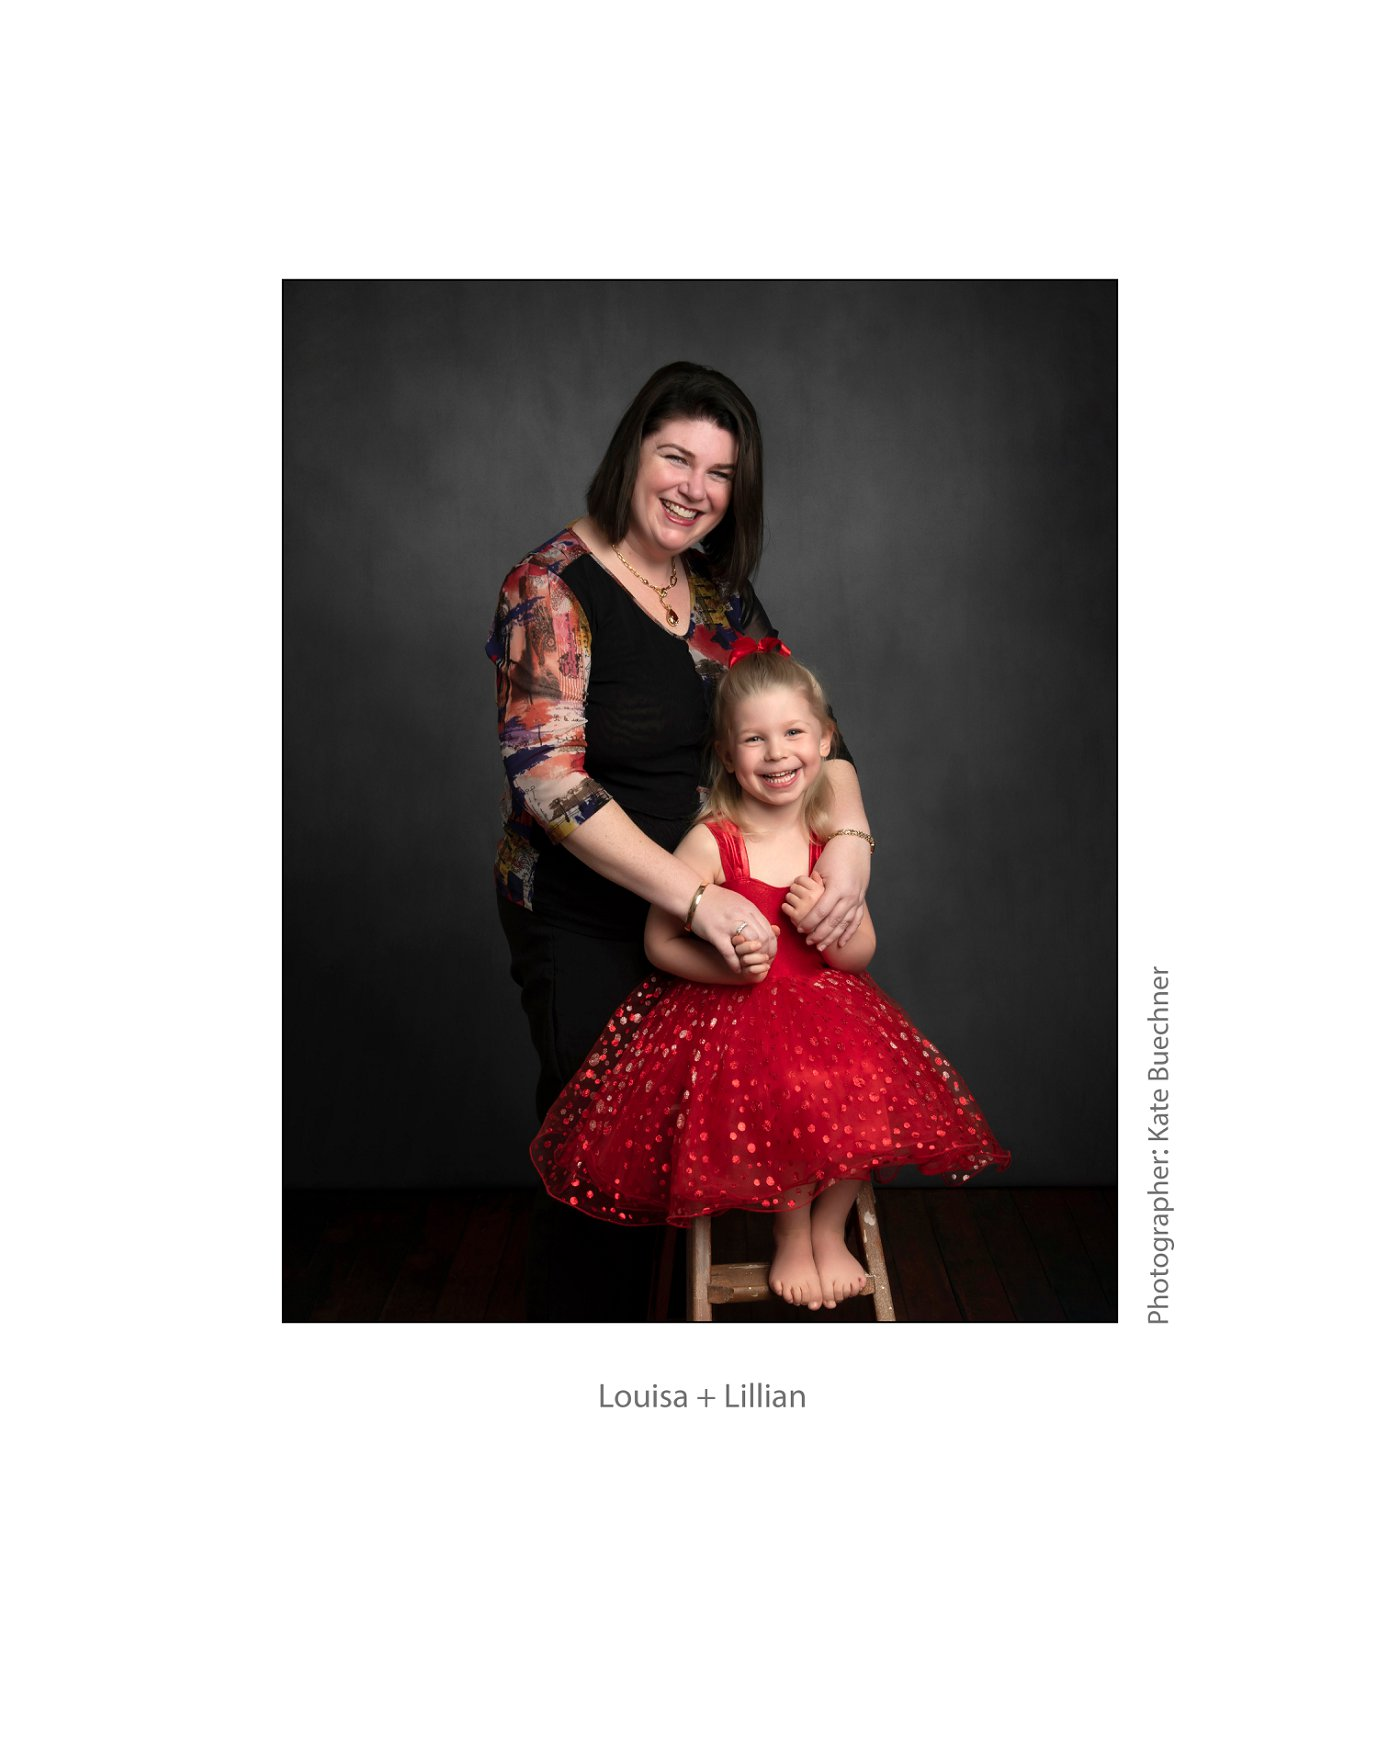 family-photographer-sydney (3).jpg